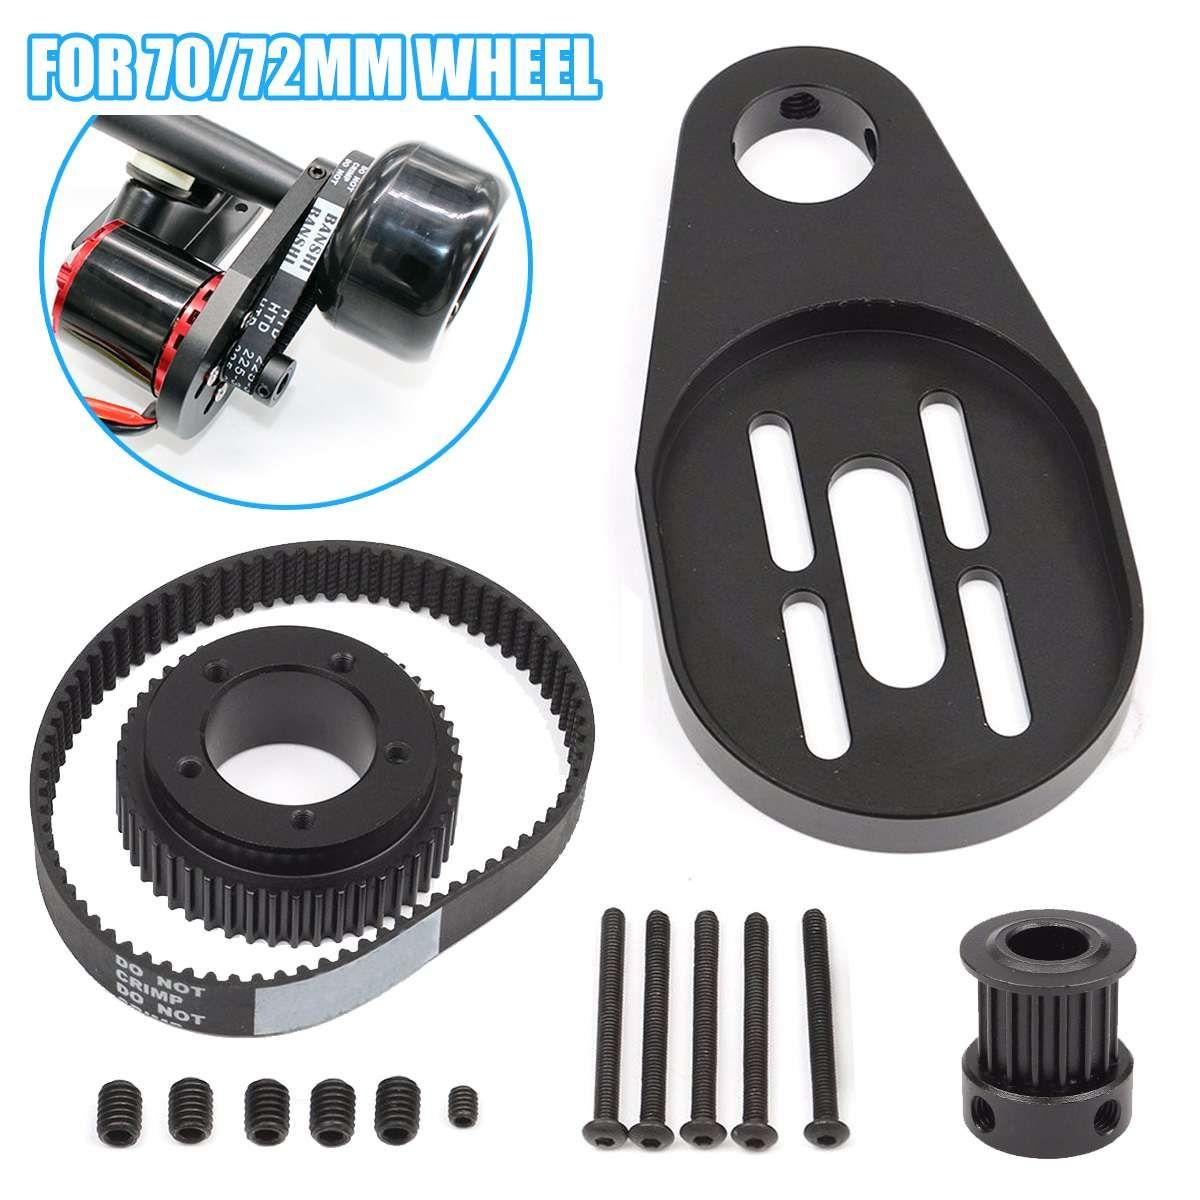 DIY Parts Pulley + Motor Mount Drive Kit For 72MM/70MM Wheel Electric Skateboard Home DIY Kit